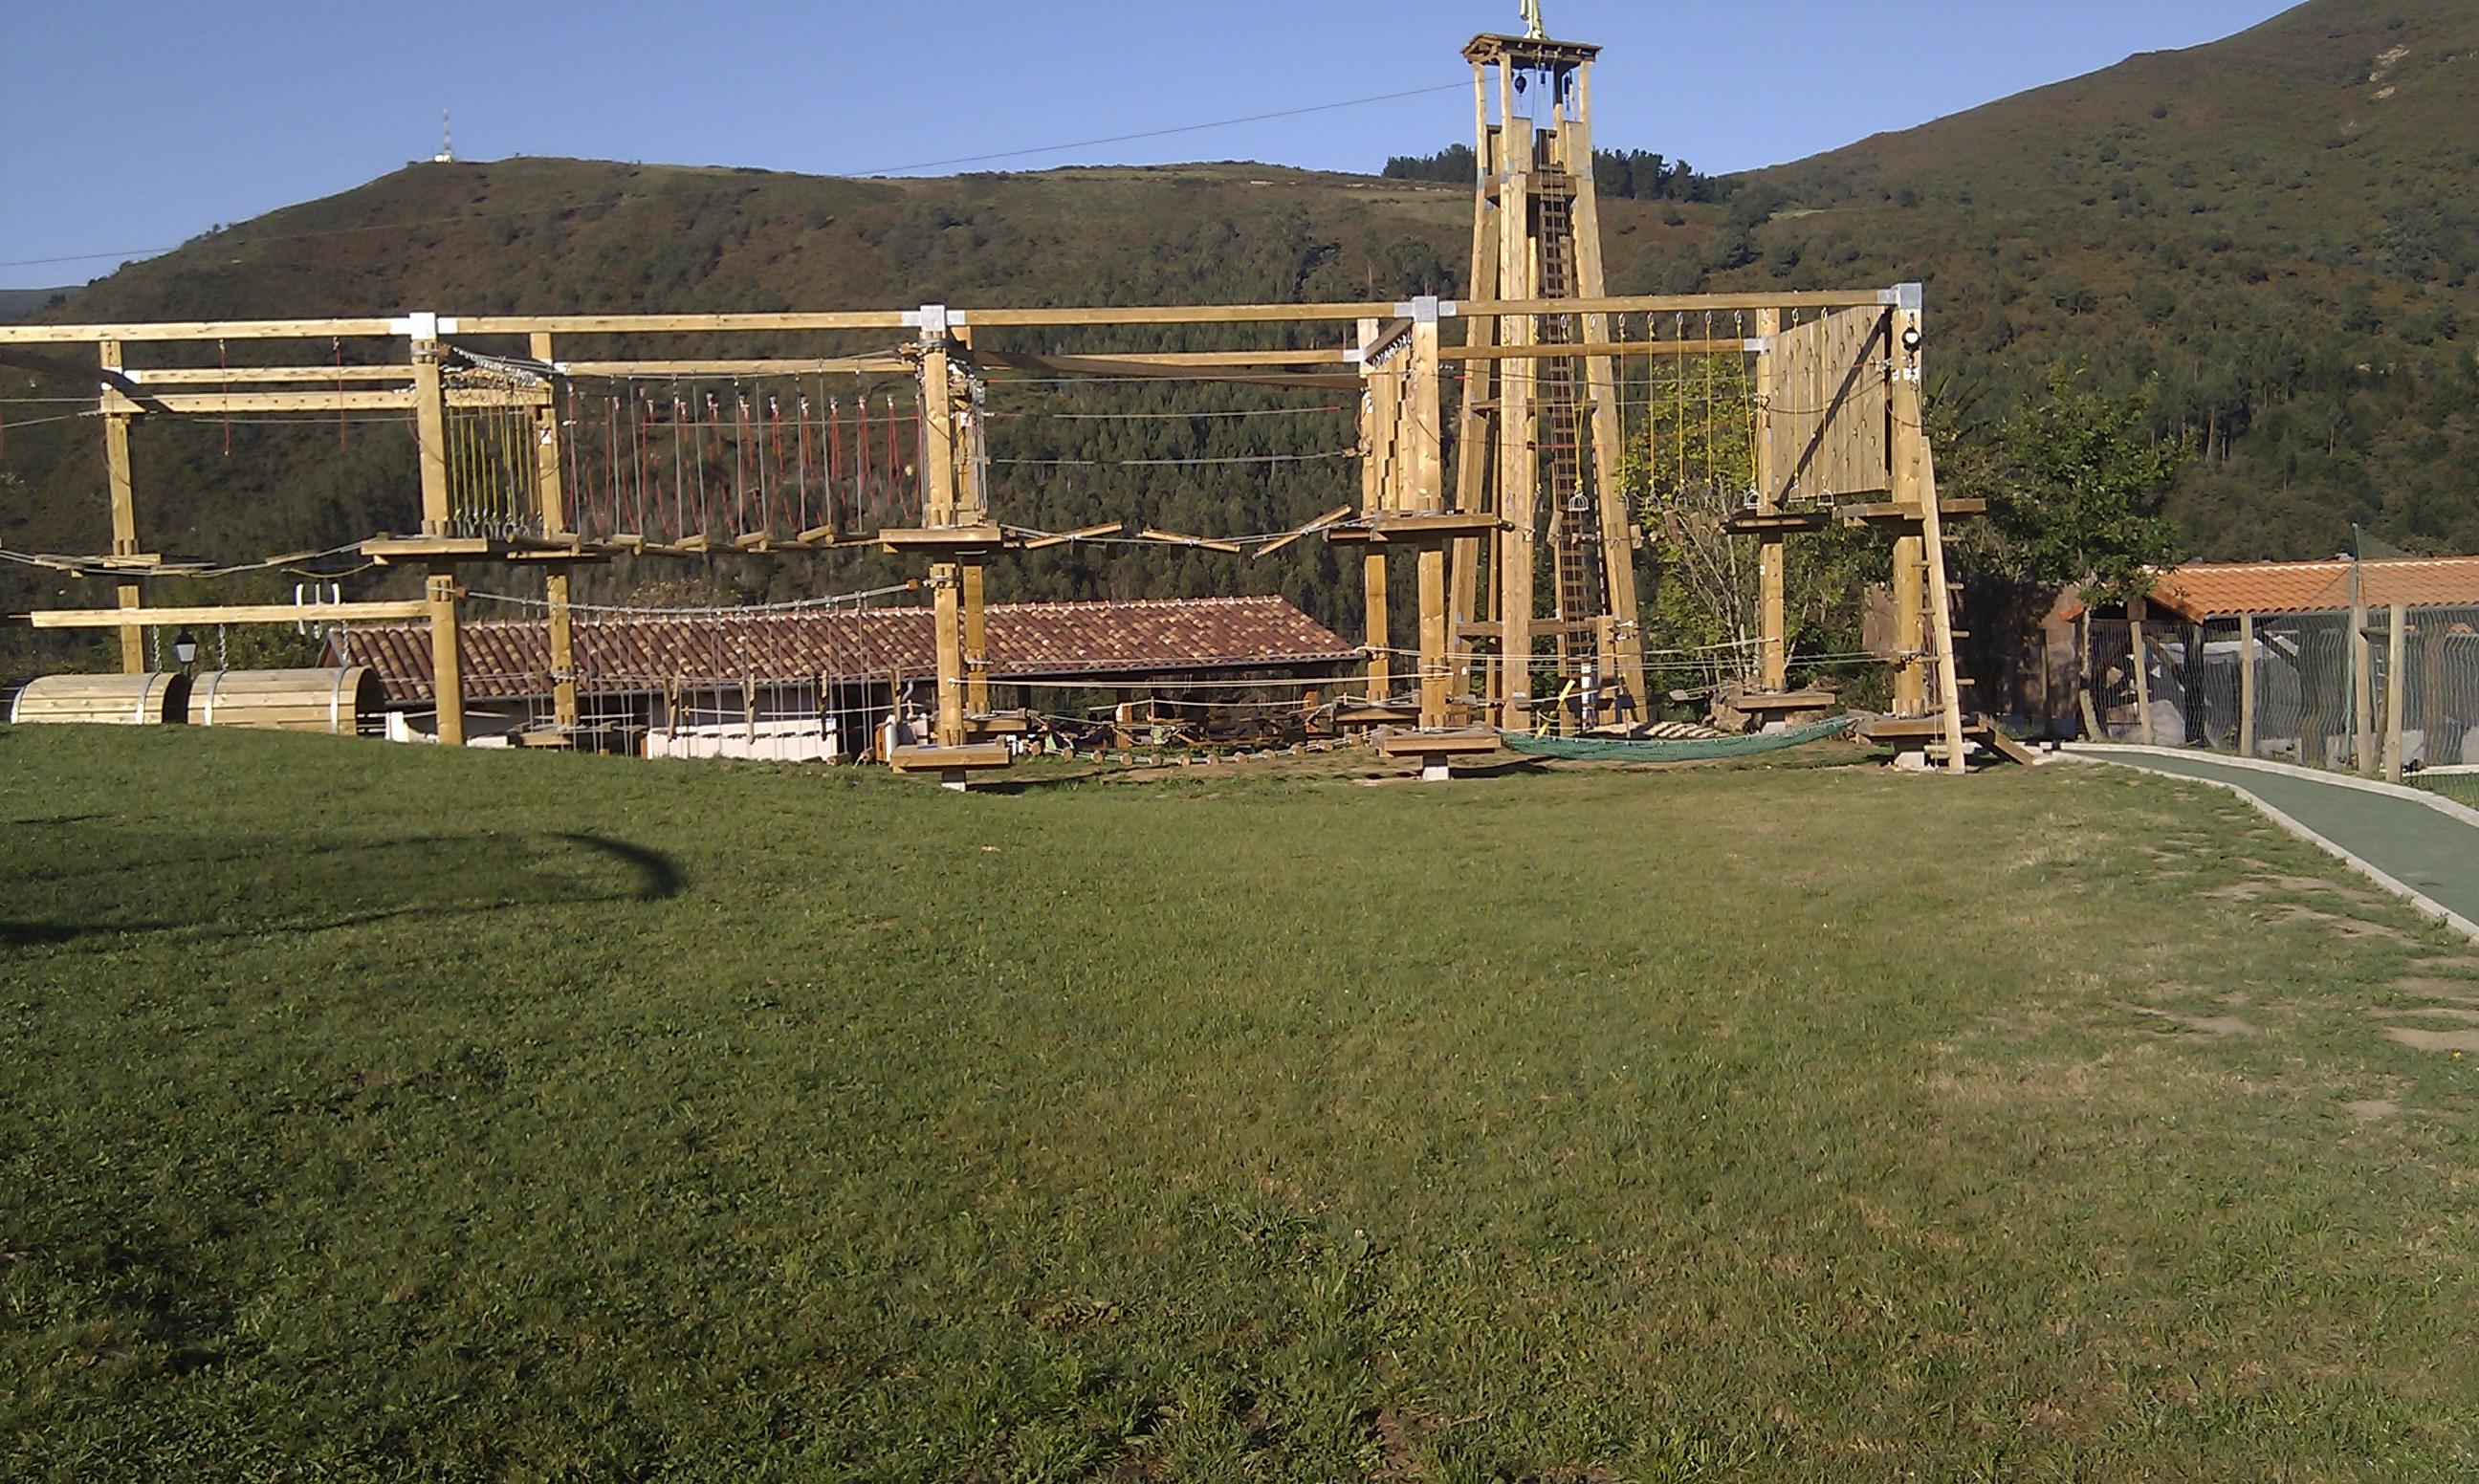 juegos_altura_tirolinas_3_Cantabria_Parque_multiaventura_ocio_juegos_cabuerniaventura